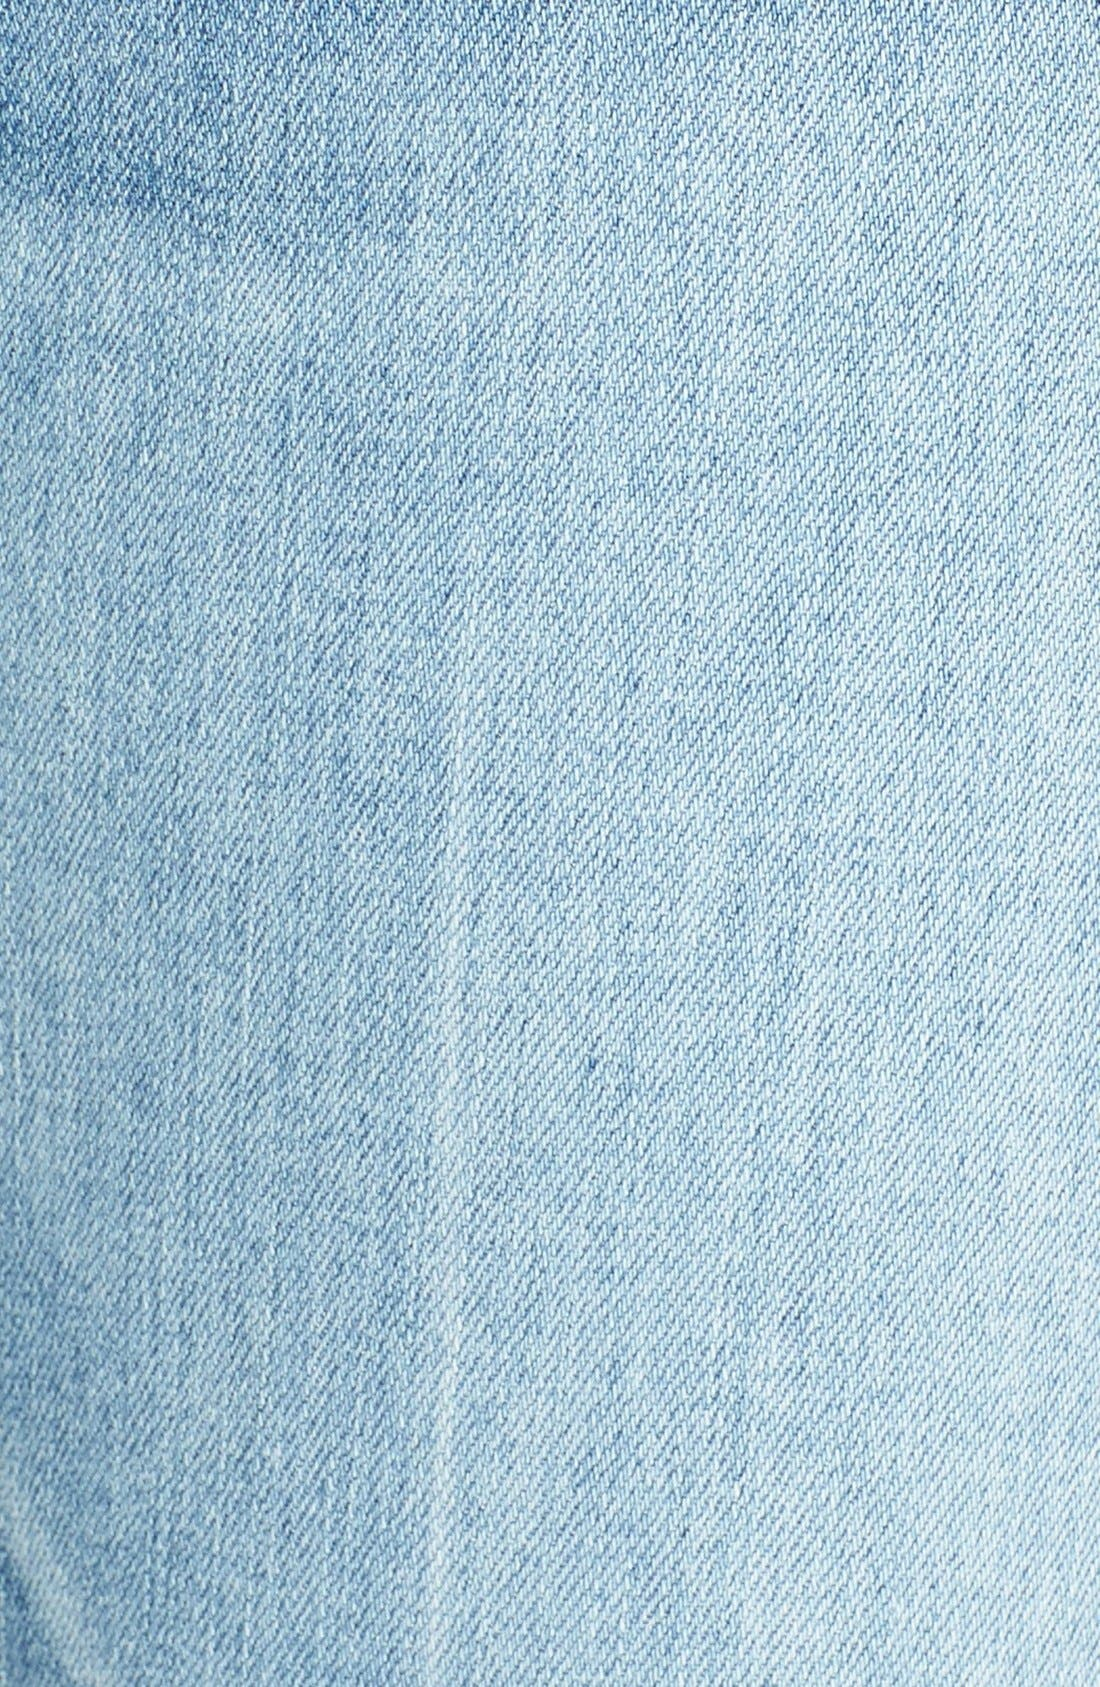 RAG & BONE,                             JEAN Distressed Crop Flare Jeans,                             Alternate thumbnail 3, color,                             451